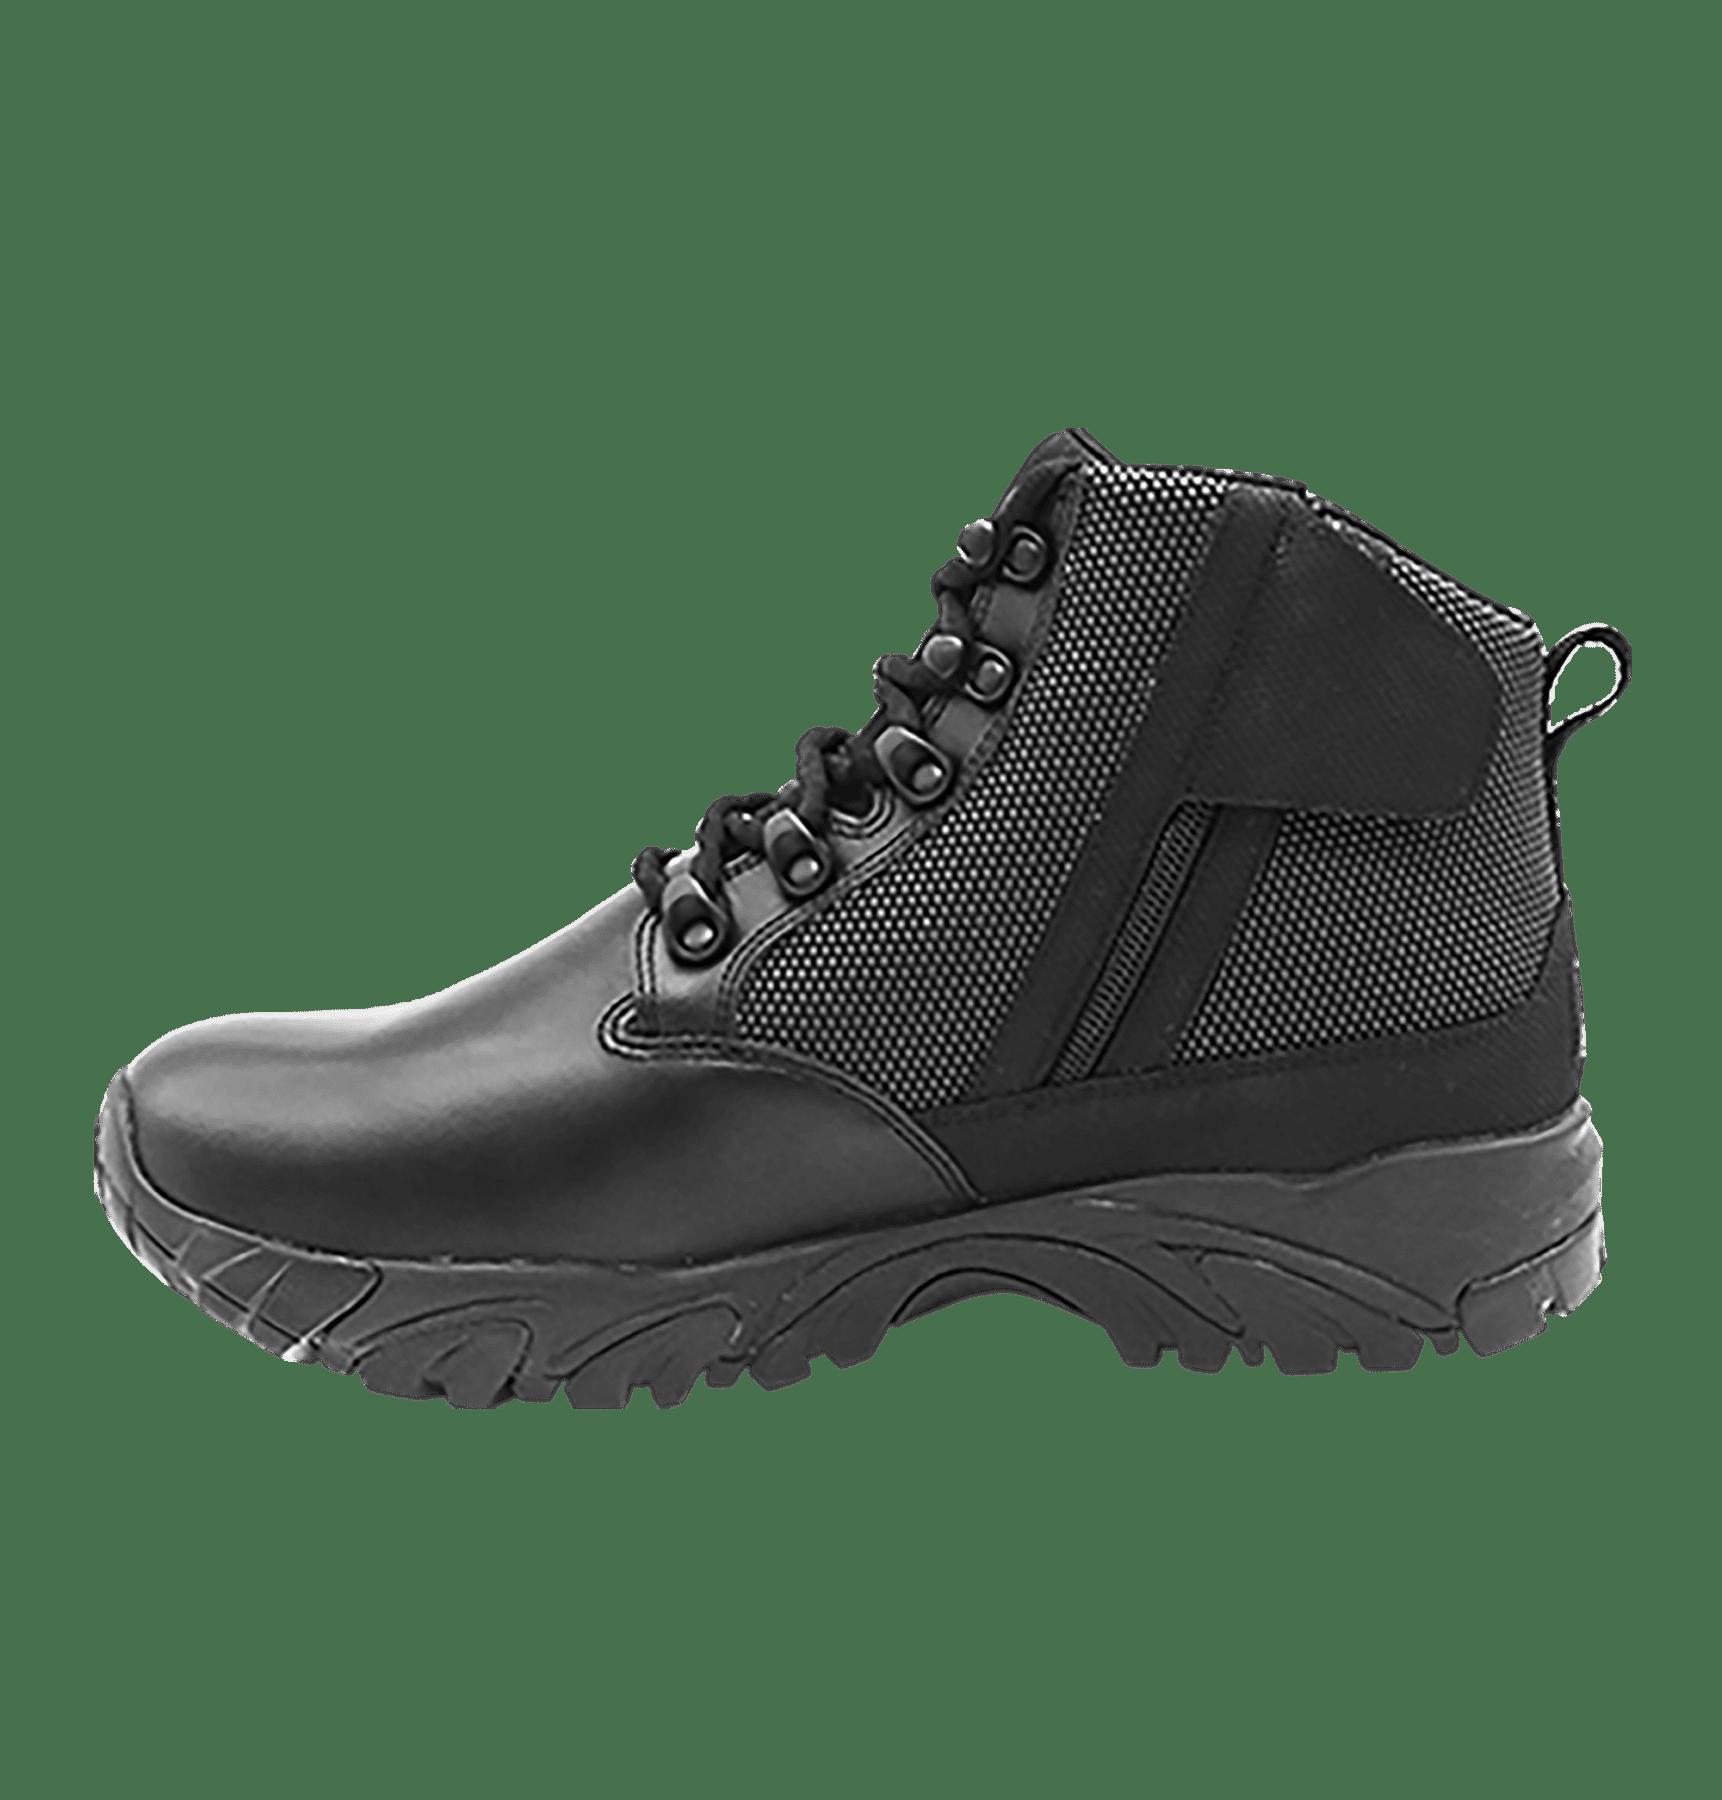 Comfortable Uniform Boots